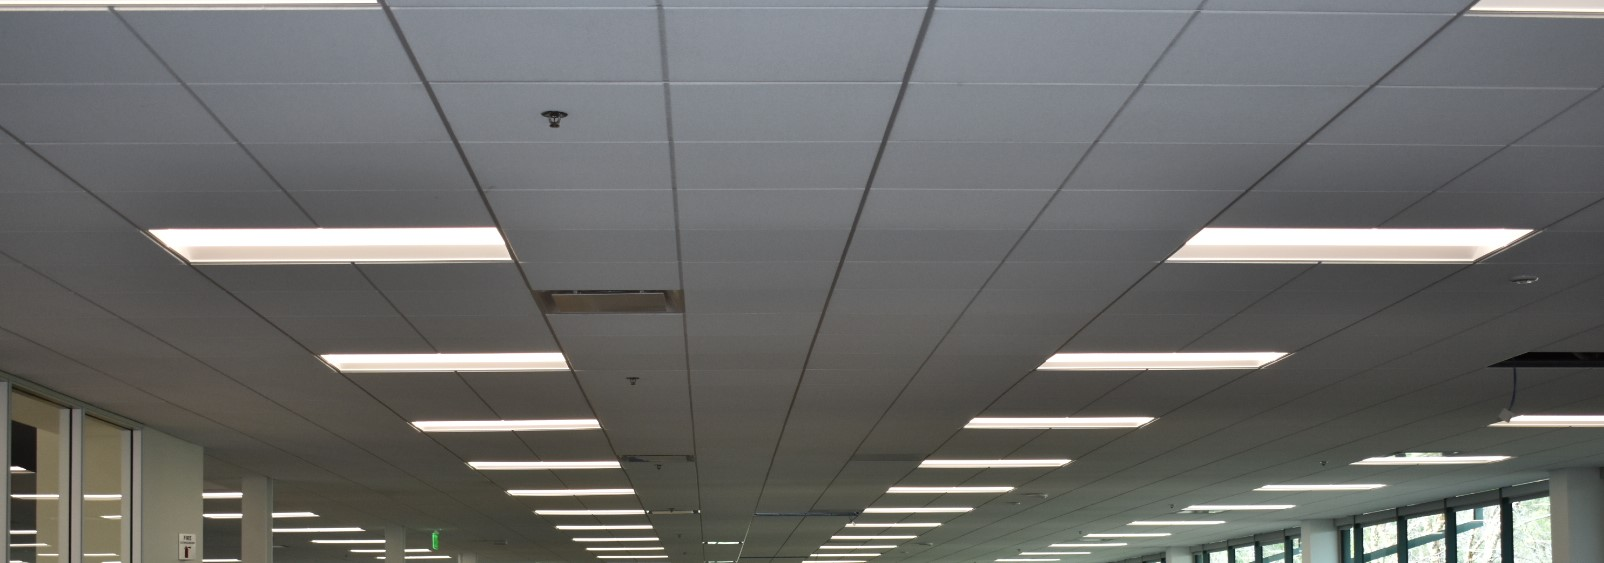 Sonic Wall Interior Lighting - 4